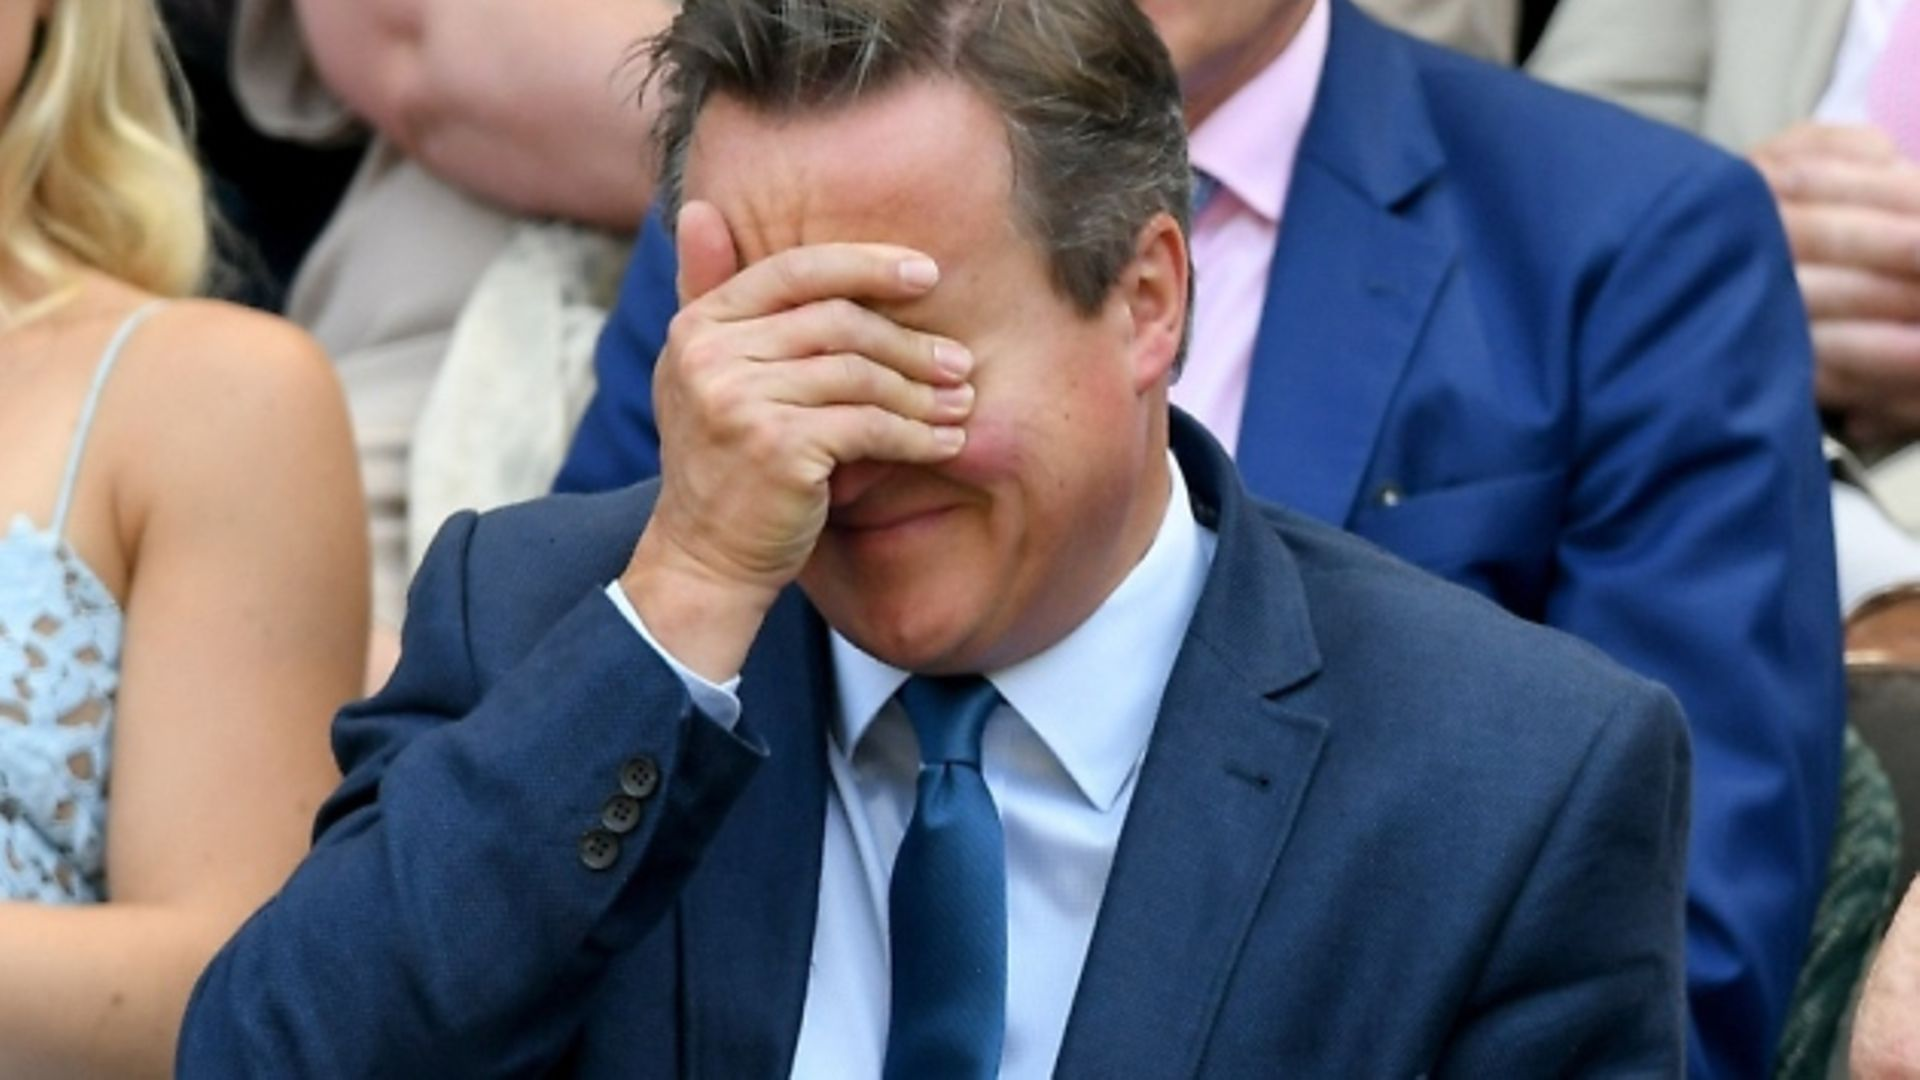 David Cameron facepalms. Photo: Karwai Tang/Getty Images